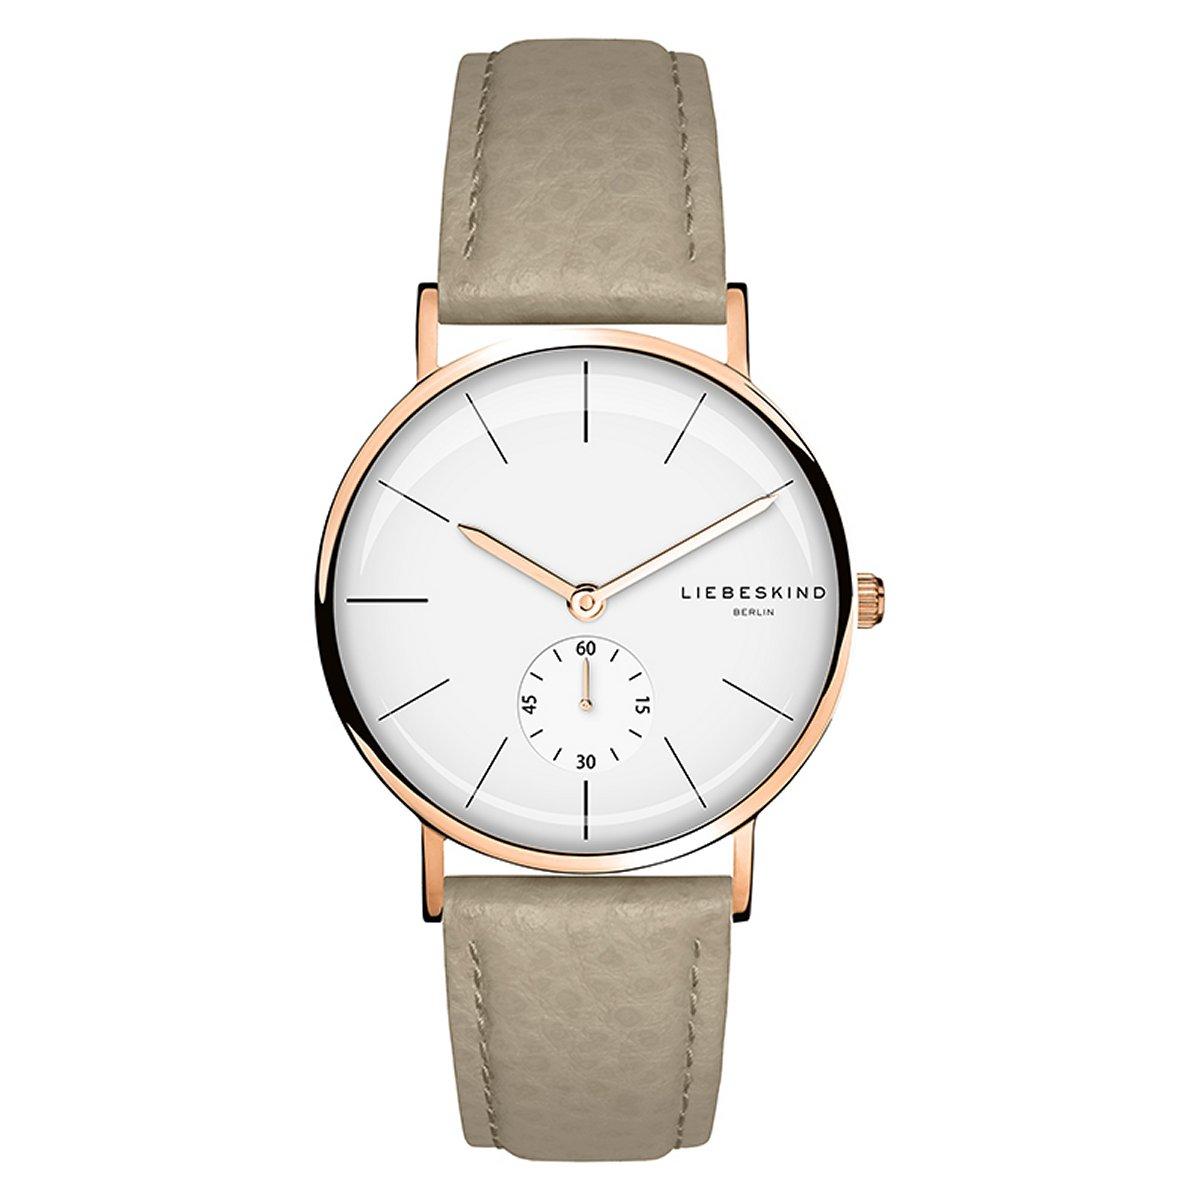 LIEBESKIND BERLIN Damen Uhr Armbanduhr Leder LT-0033-LQ